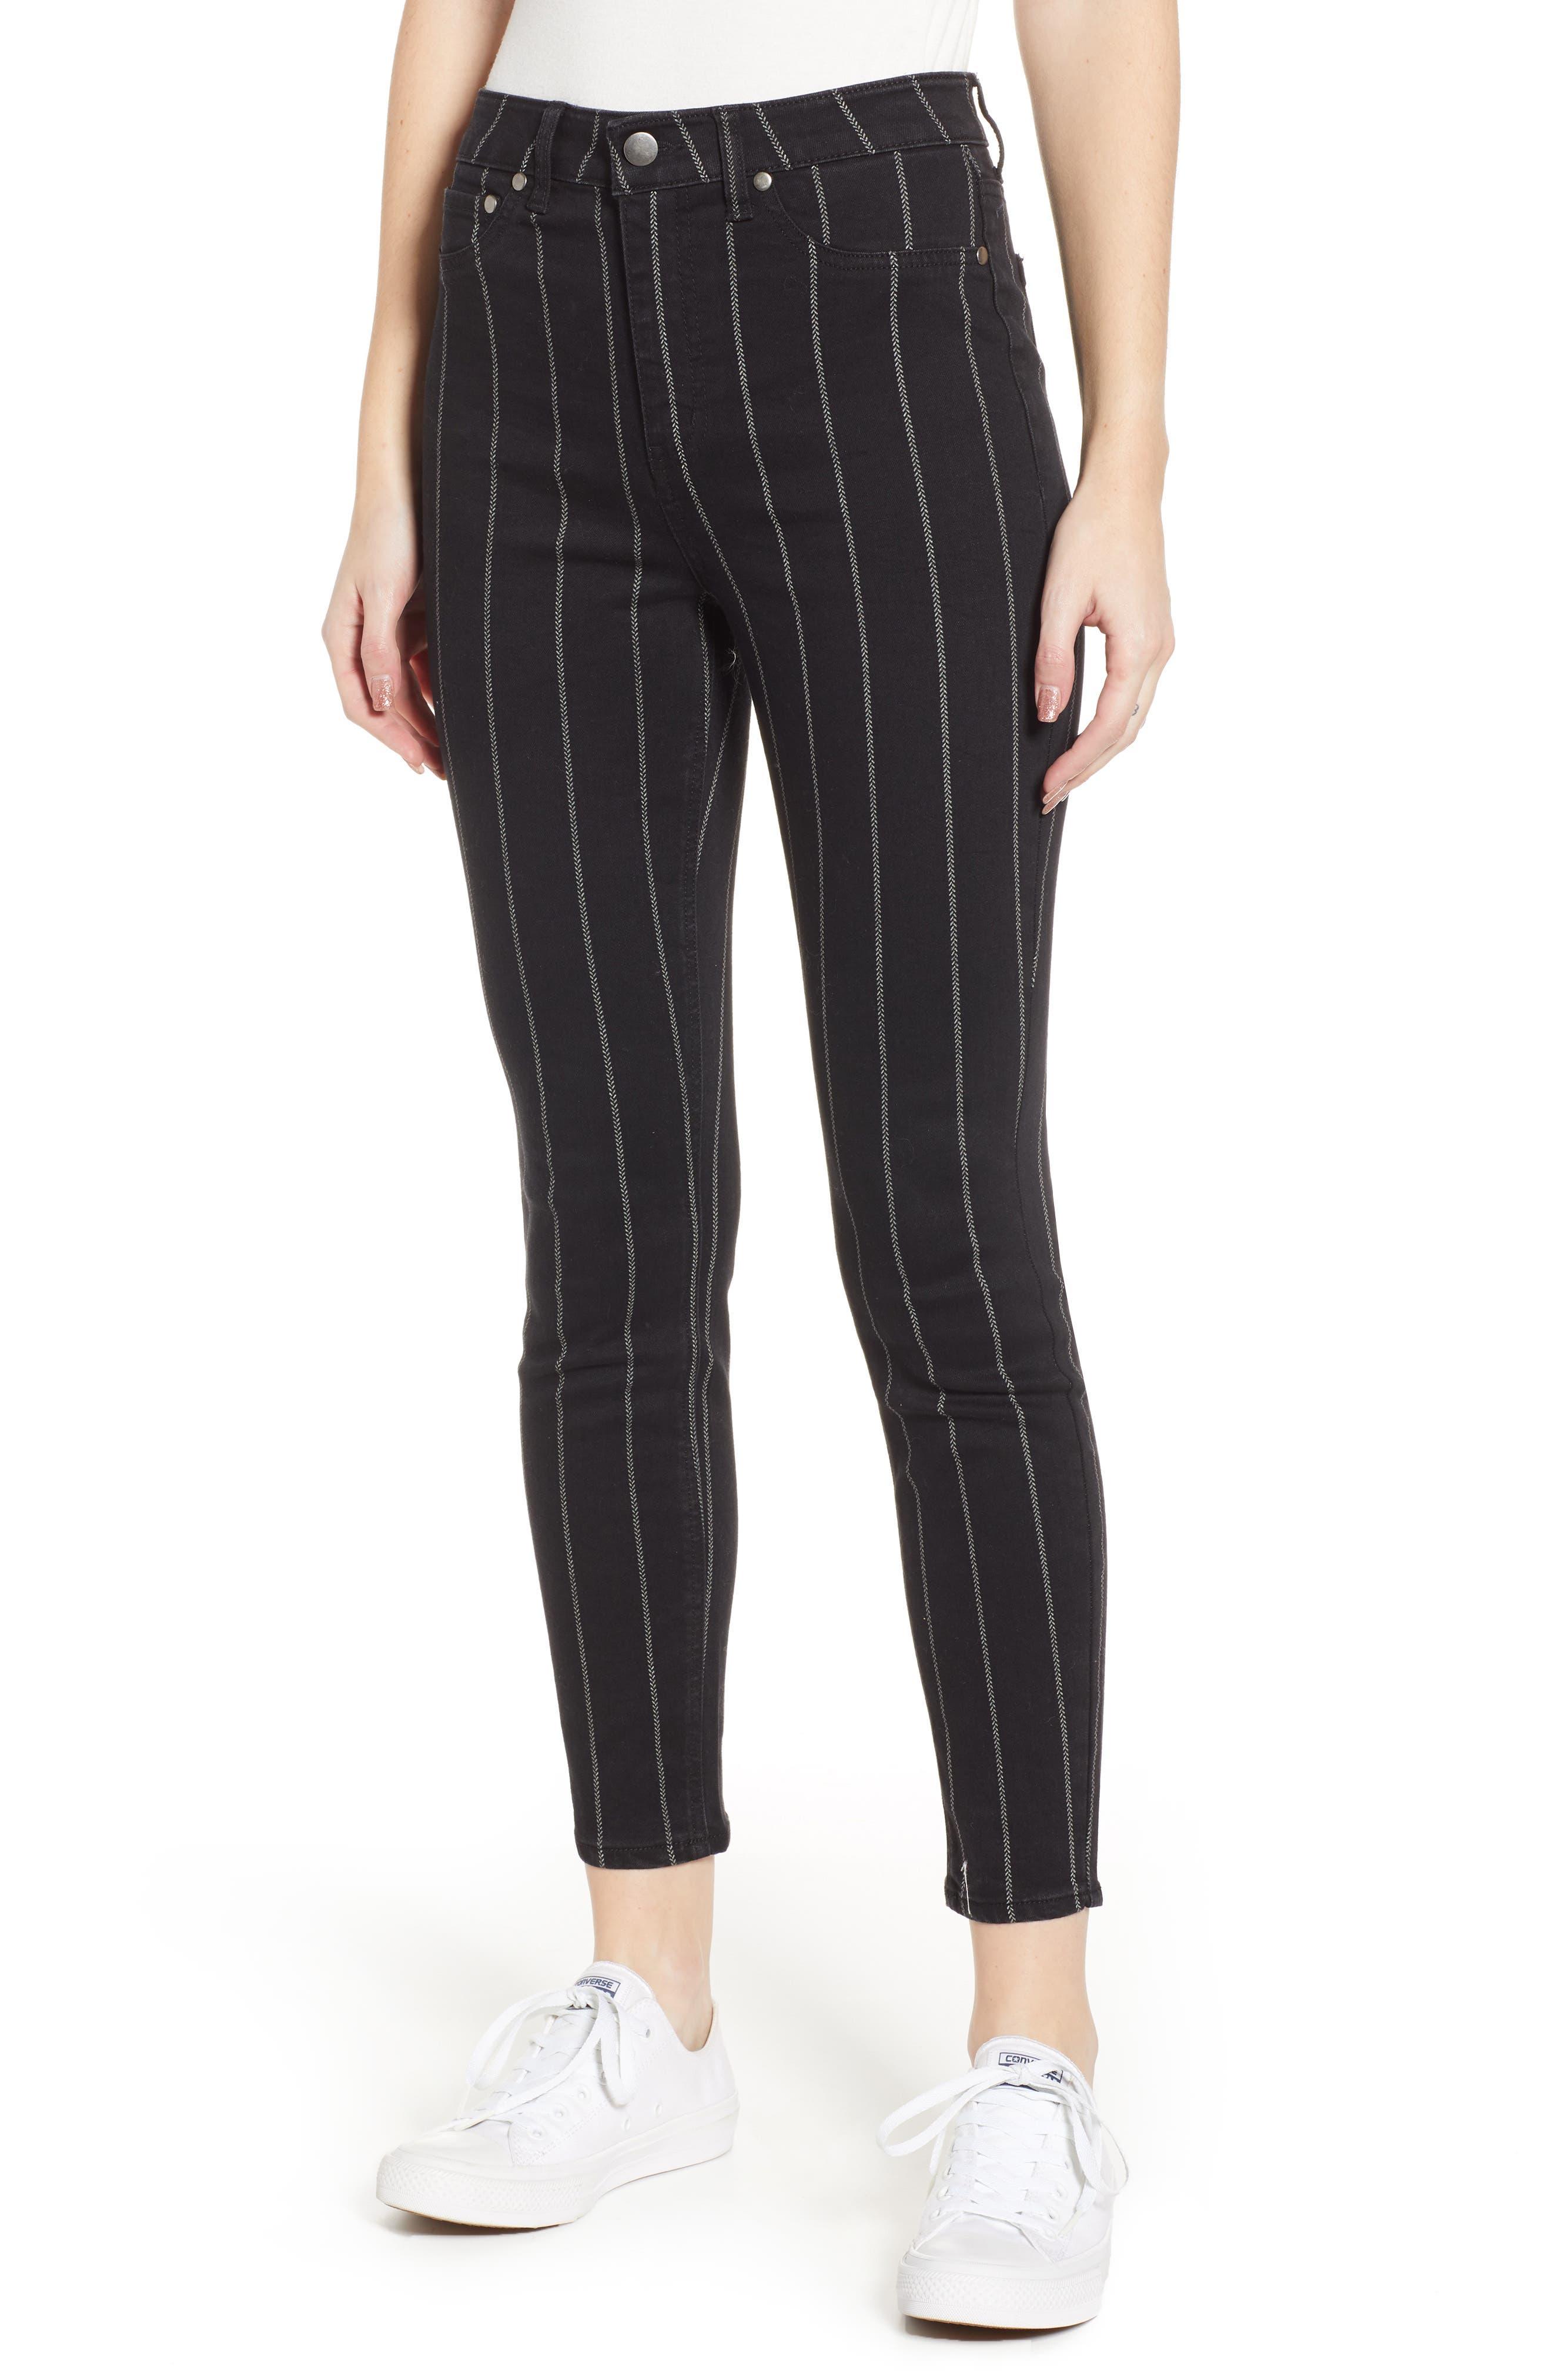 TINSEL, Stripe High Rise Skinny Jeans, Main thumbnail 1, color, 001